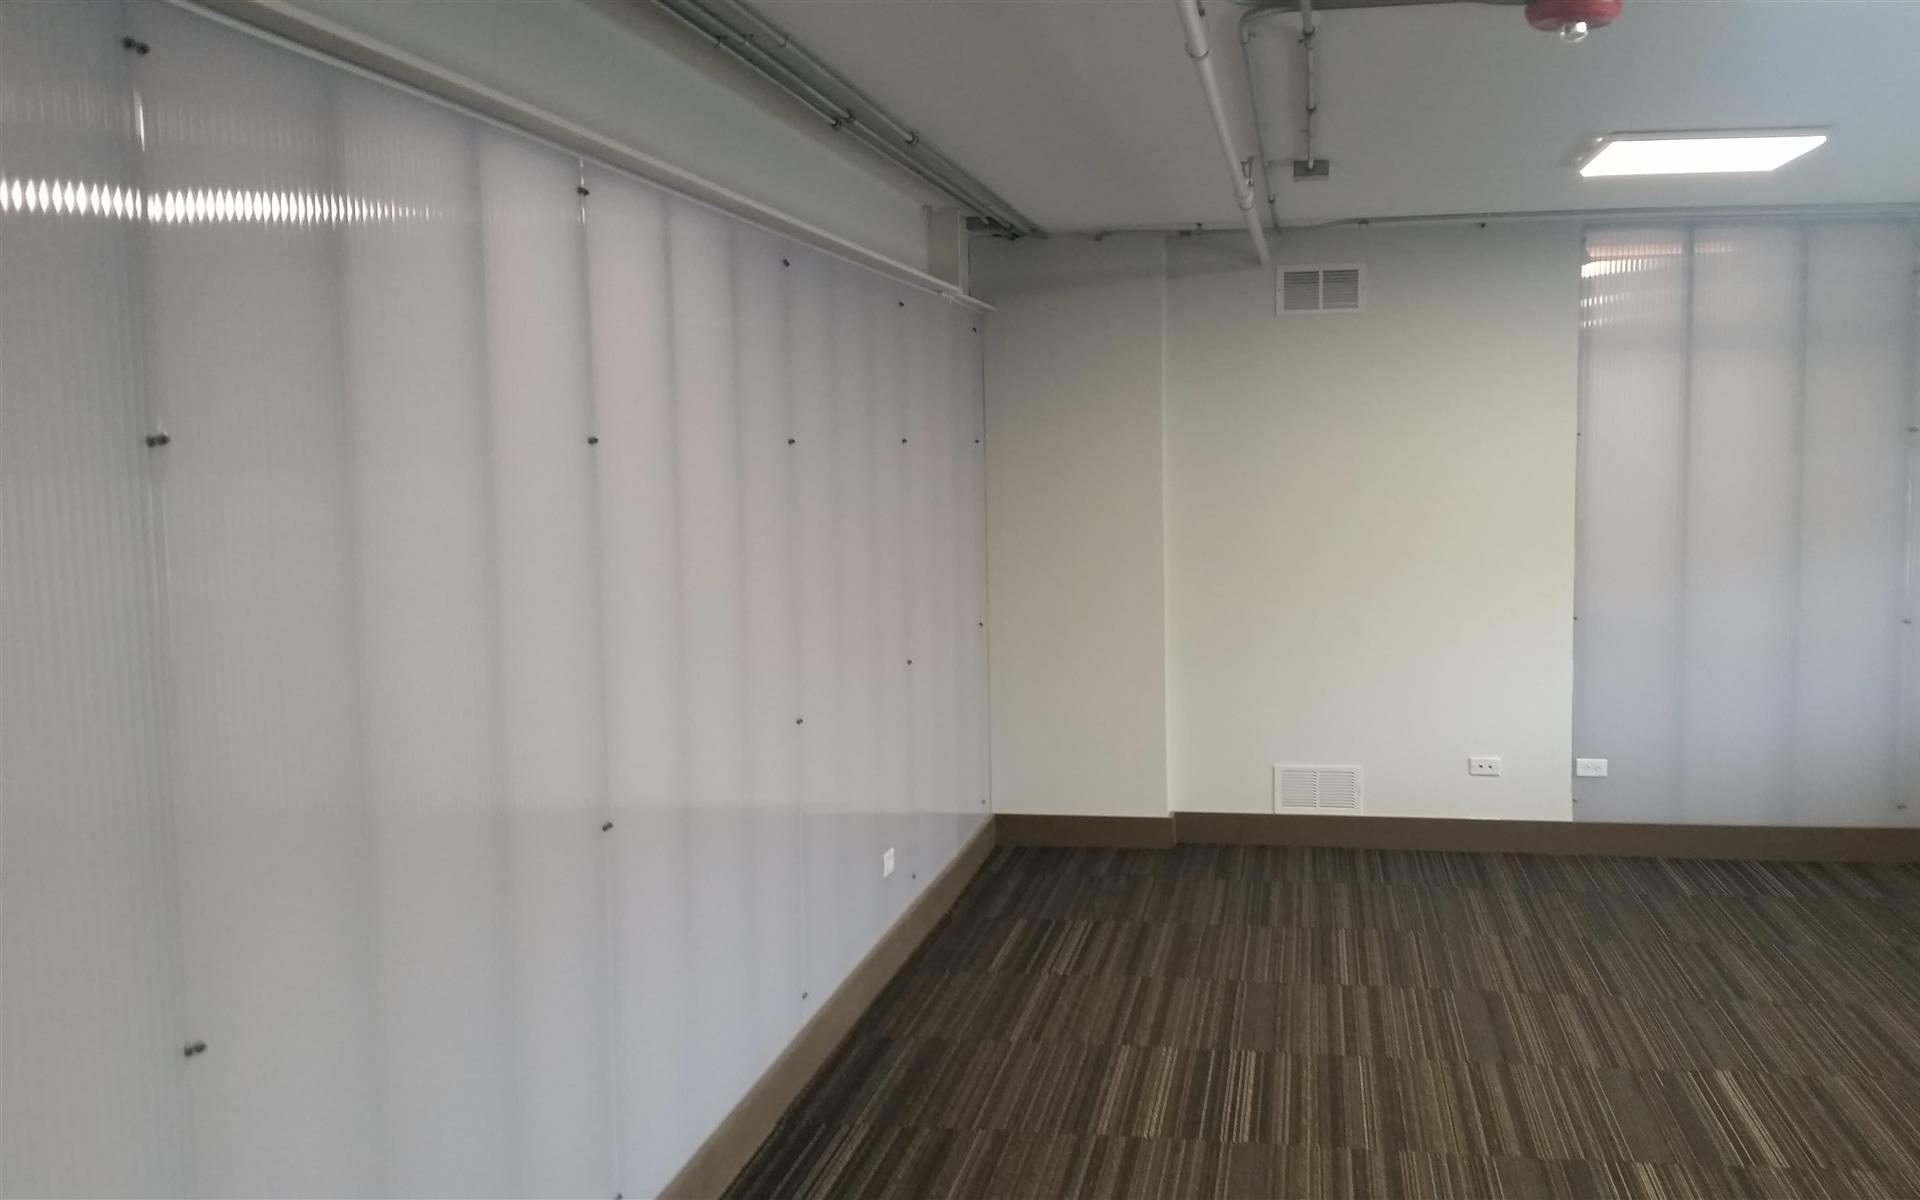 8042-8052 monticello - Office 101